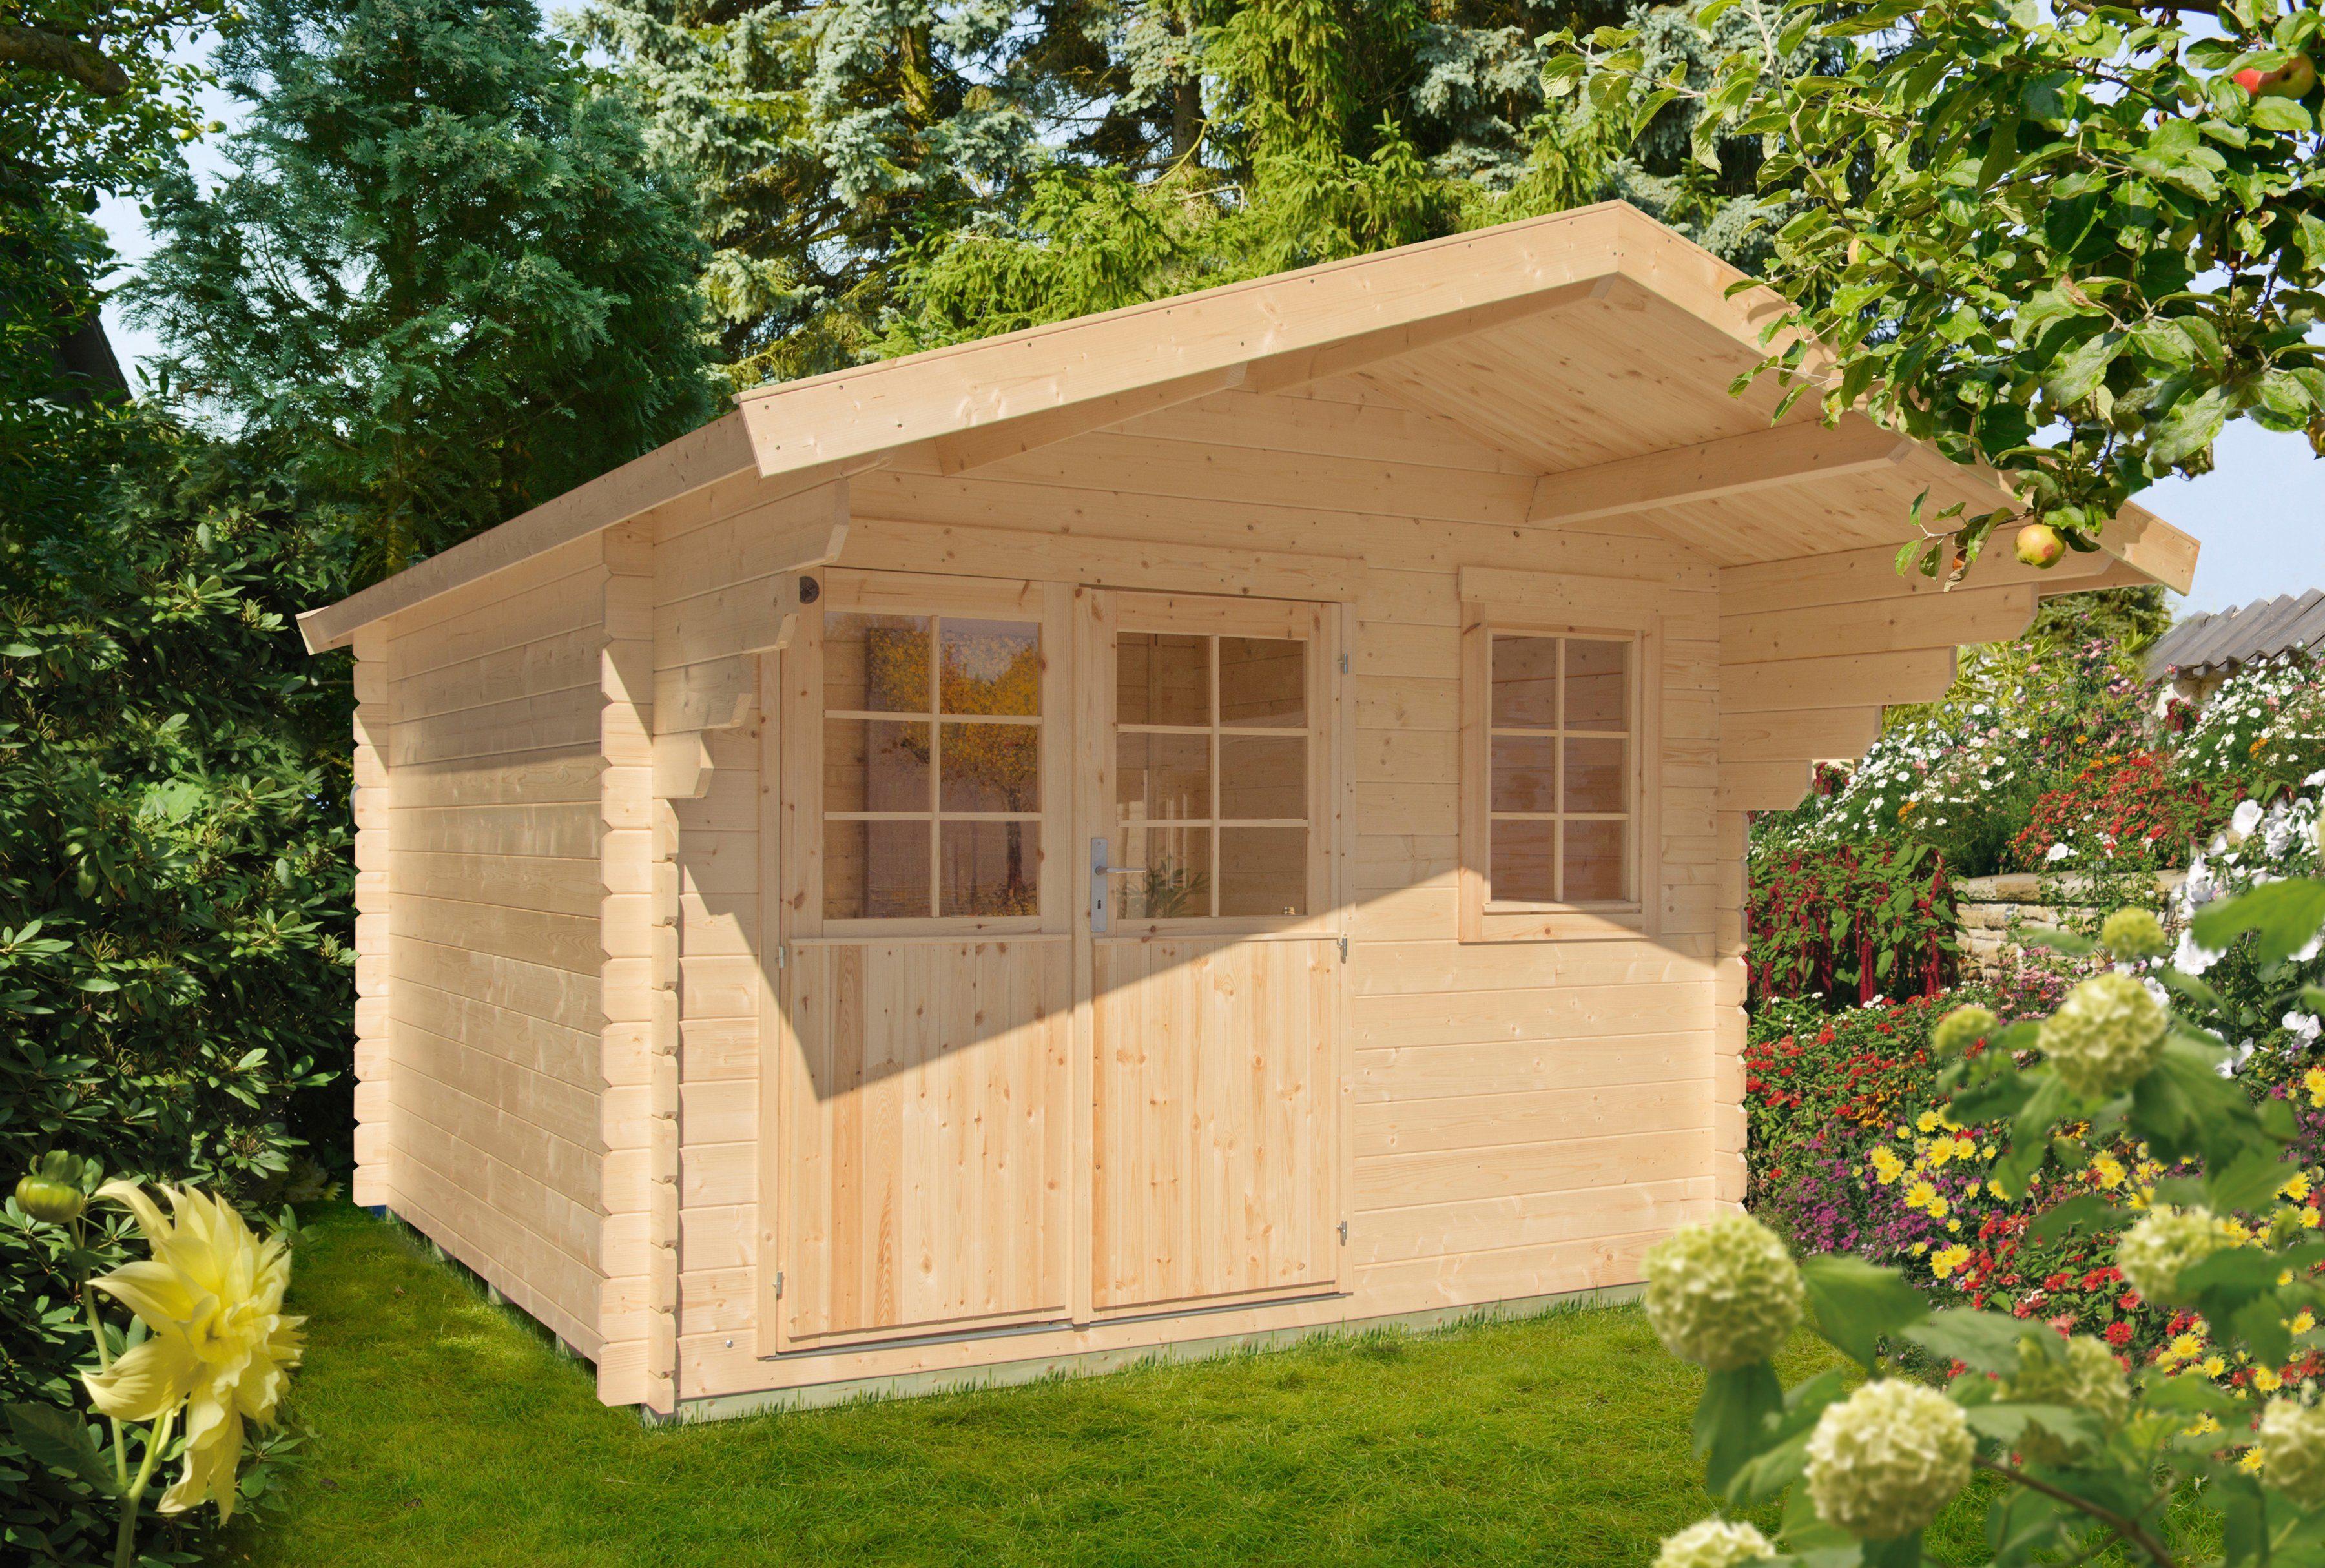 Gartenhaus Fußboden Ja Oder Nein ~ Luoman gartenhaus lillevilla « bxt cm inkl